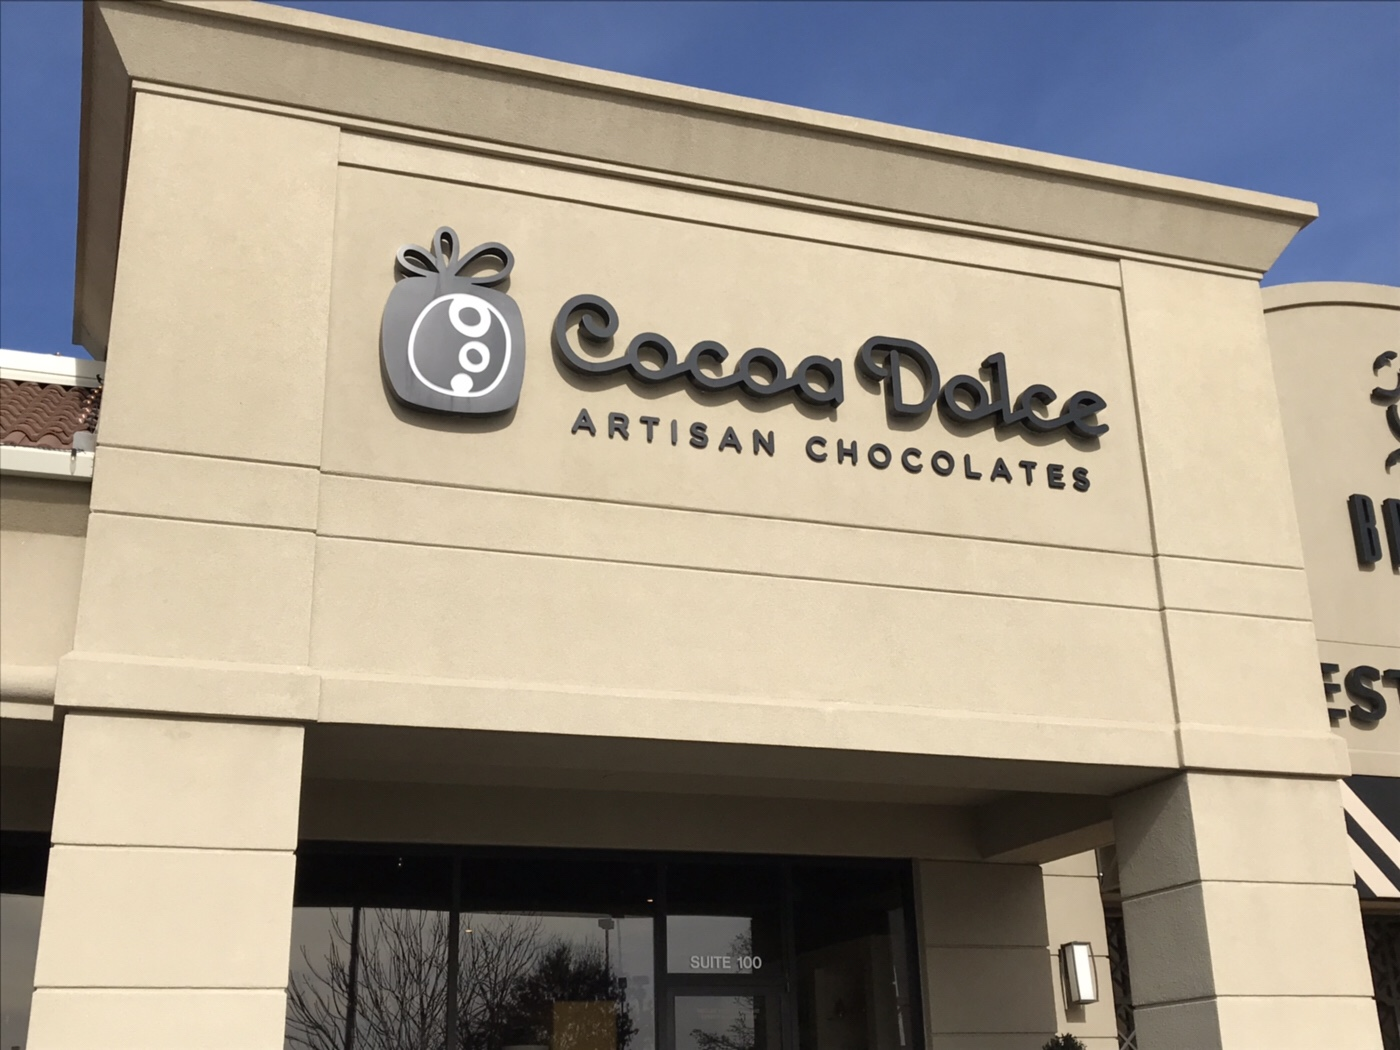 Cocoa Dolce Chocolates